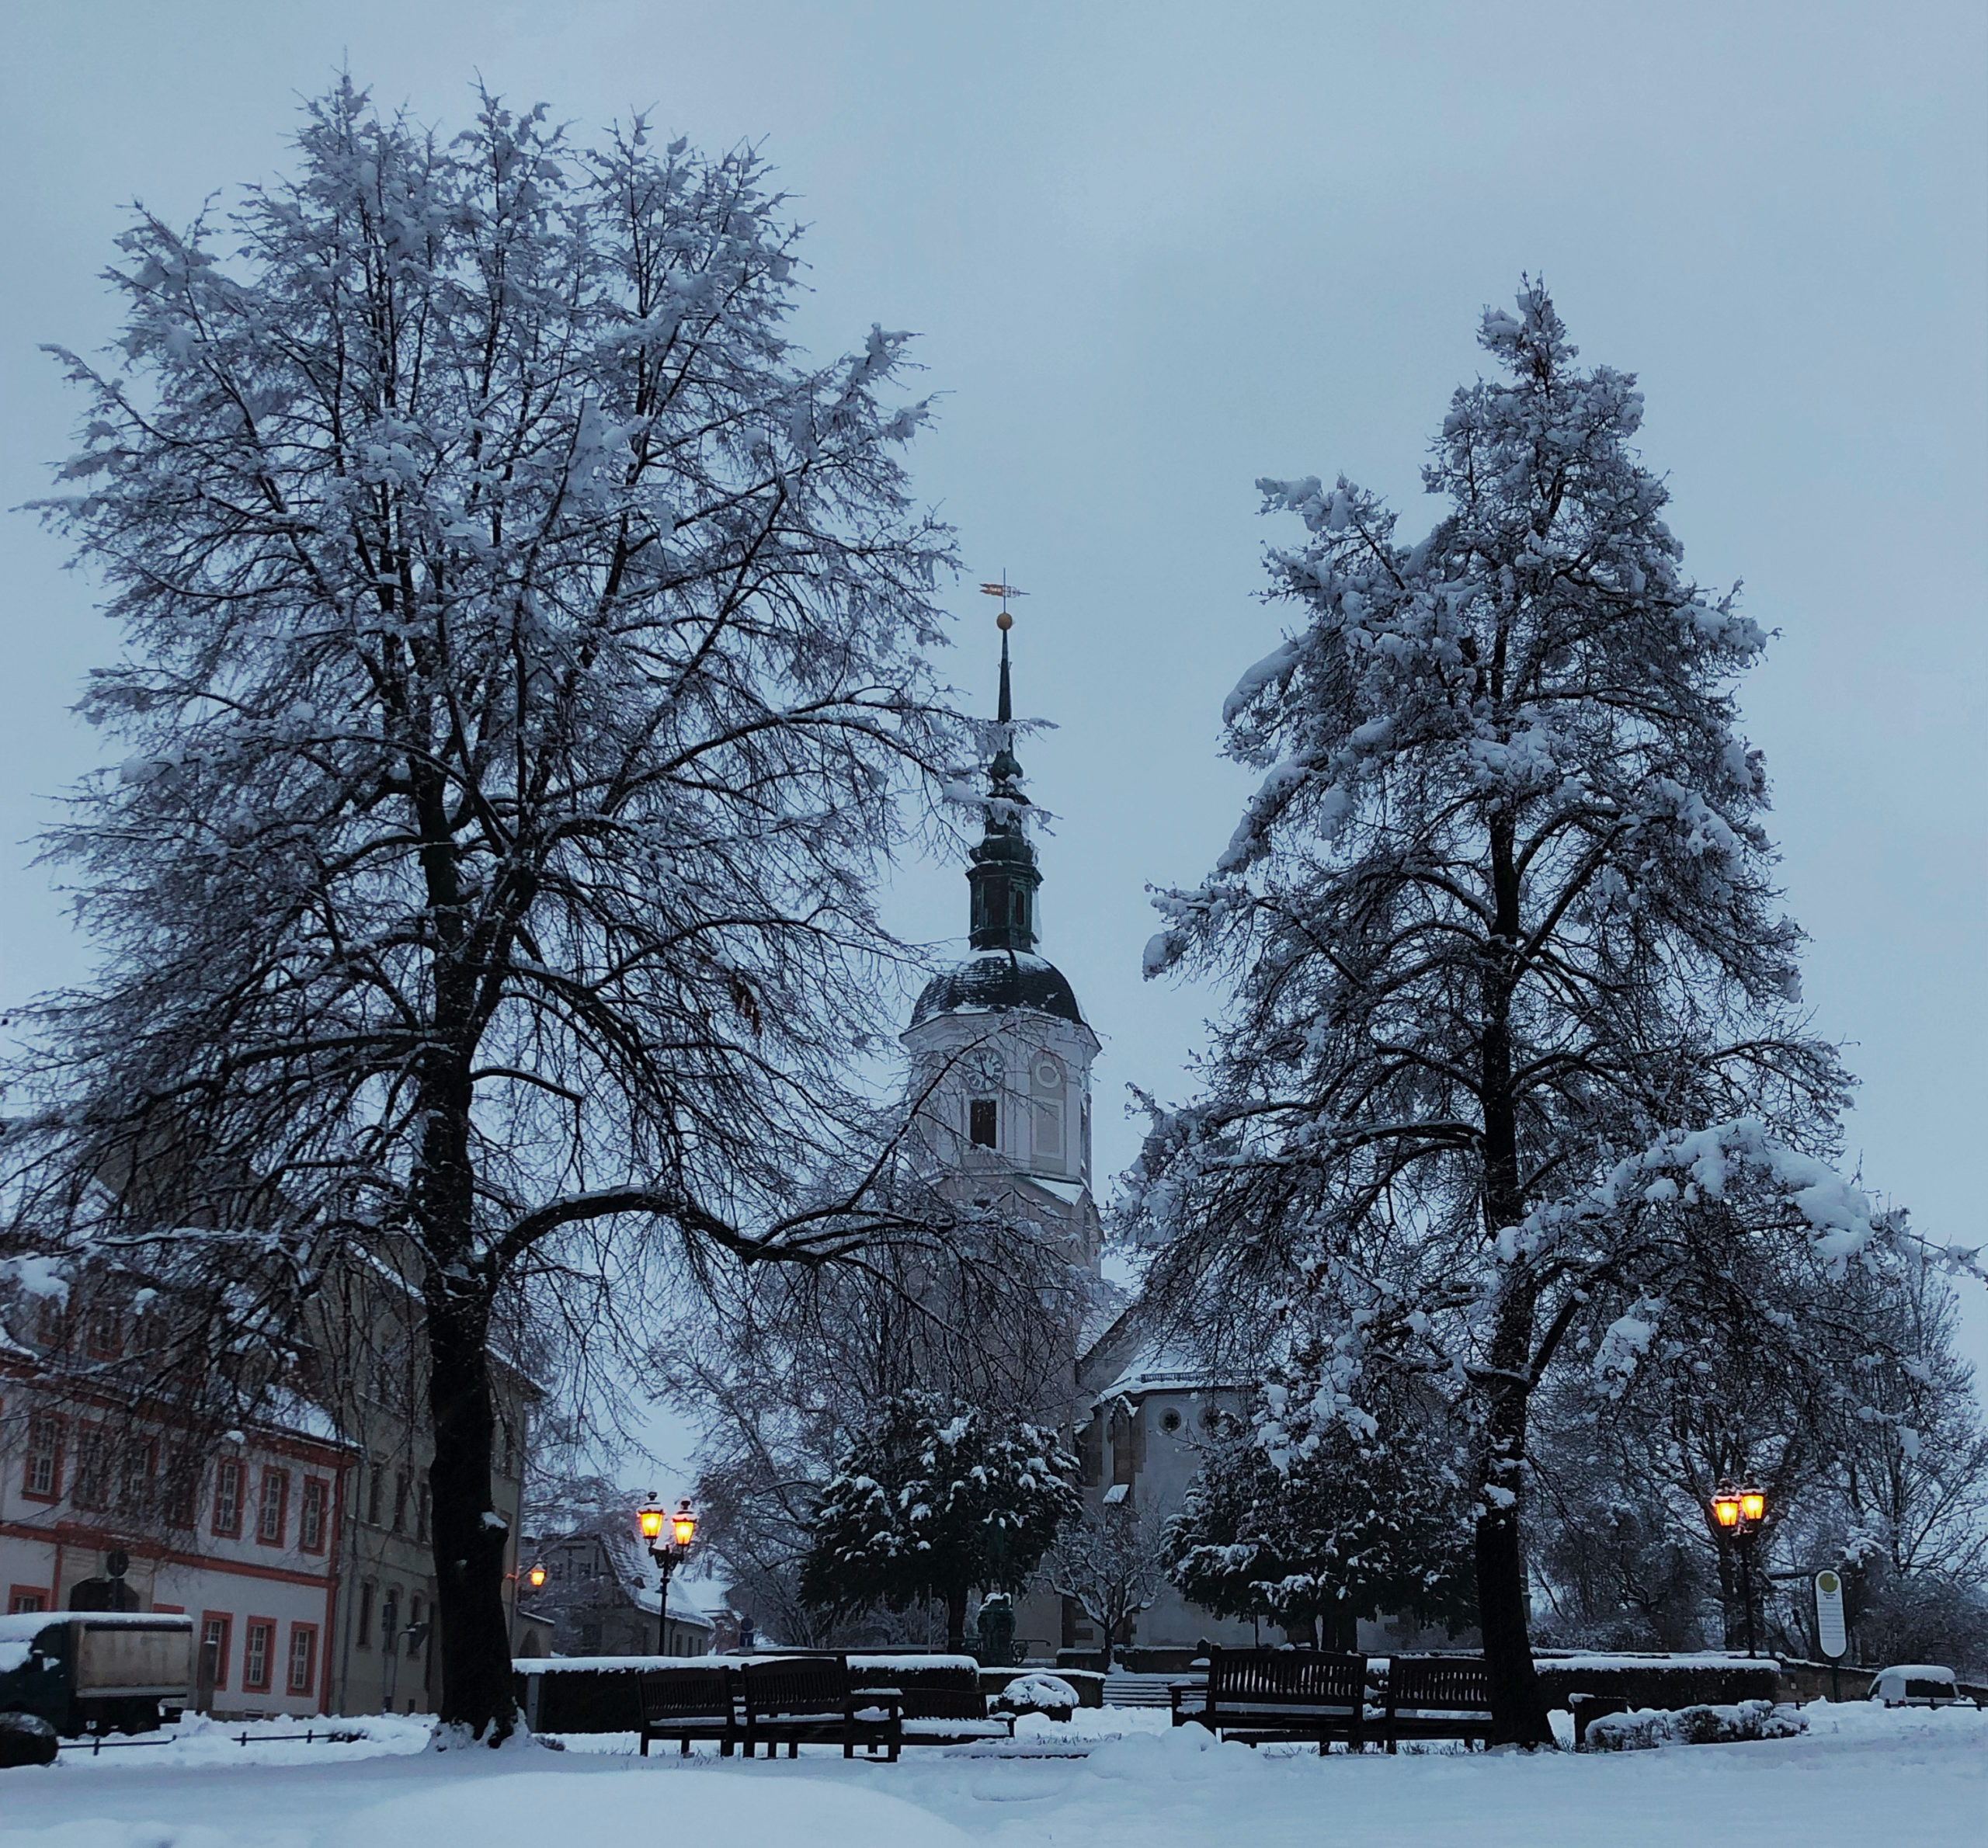 Winter Marktplatz Stadt Dohna Heiko Scholz